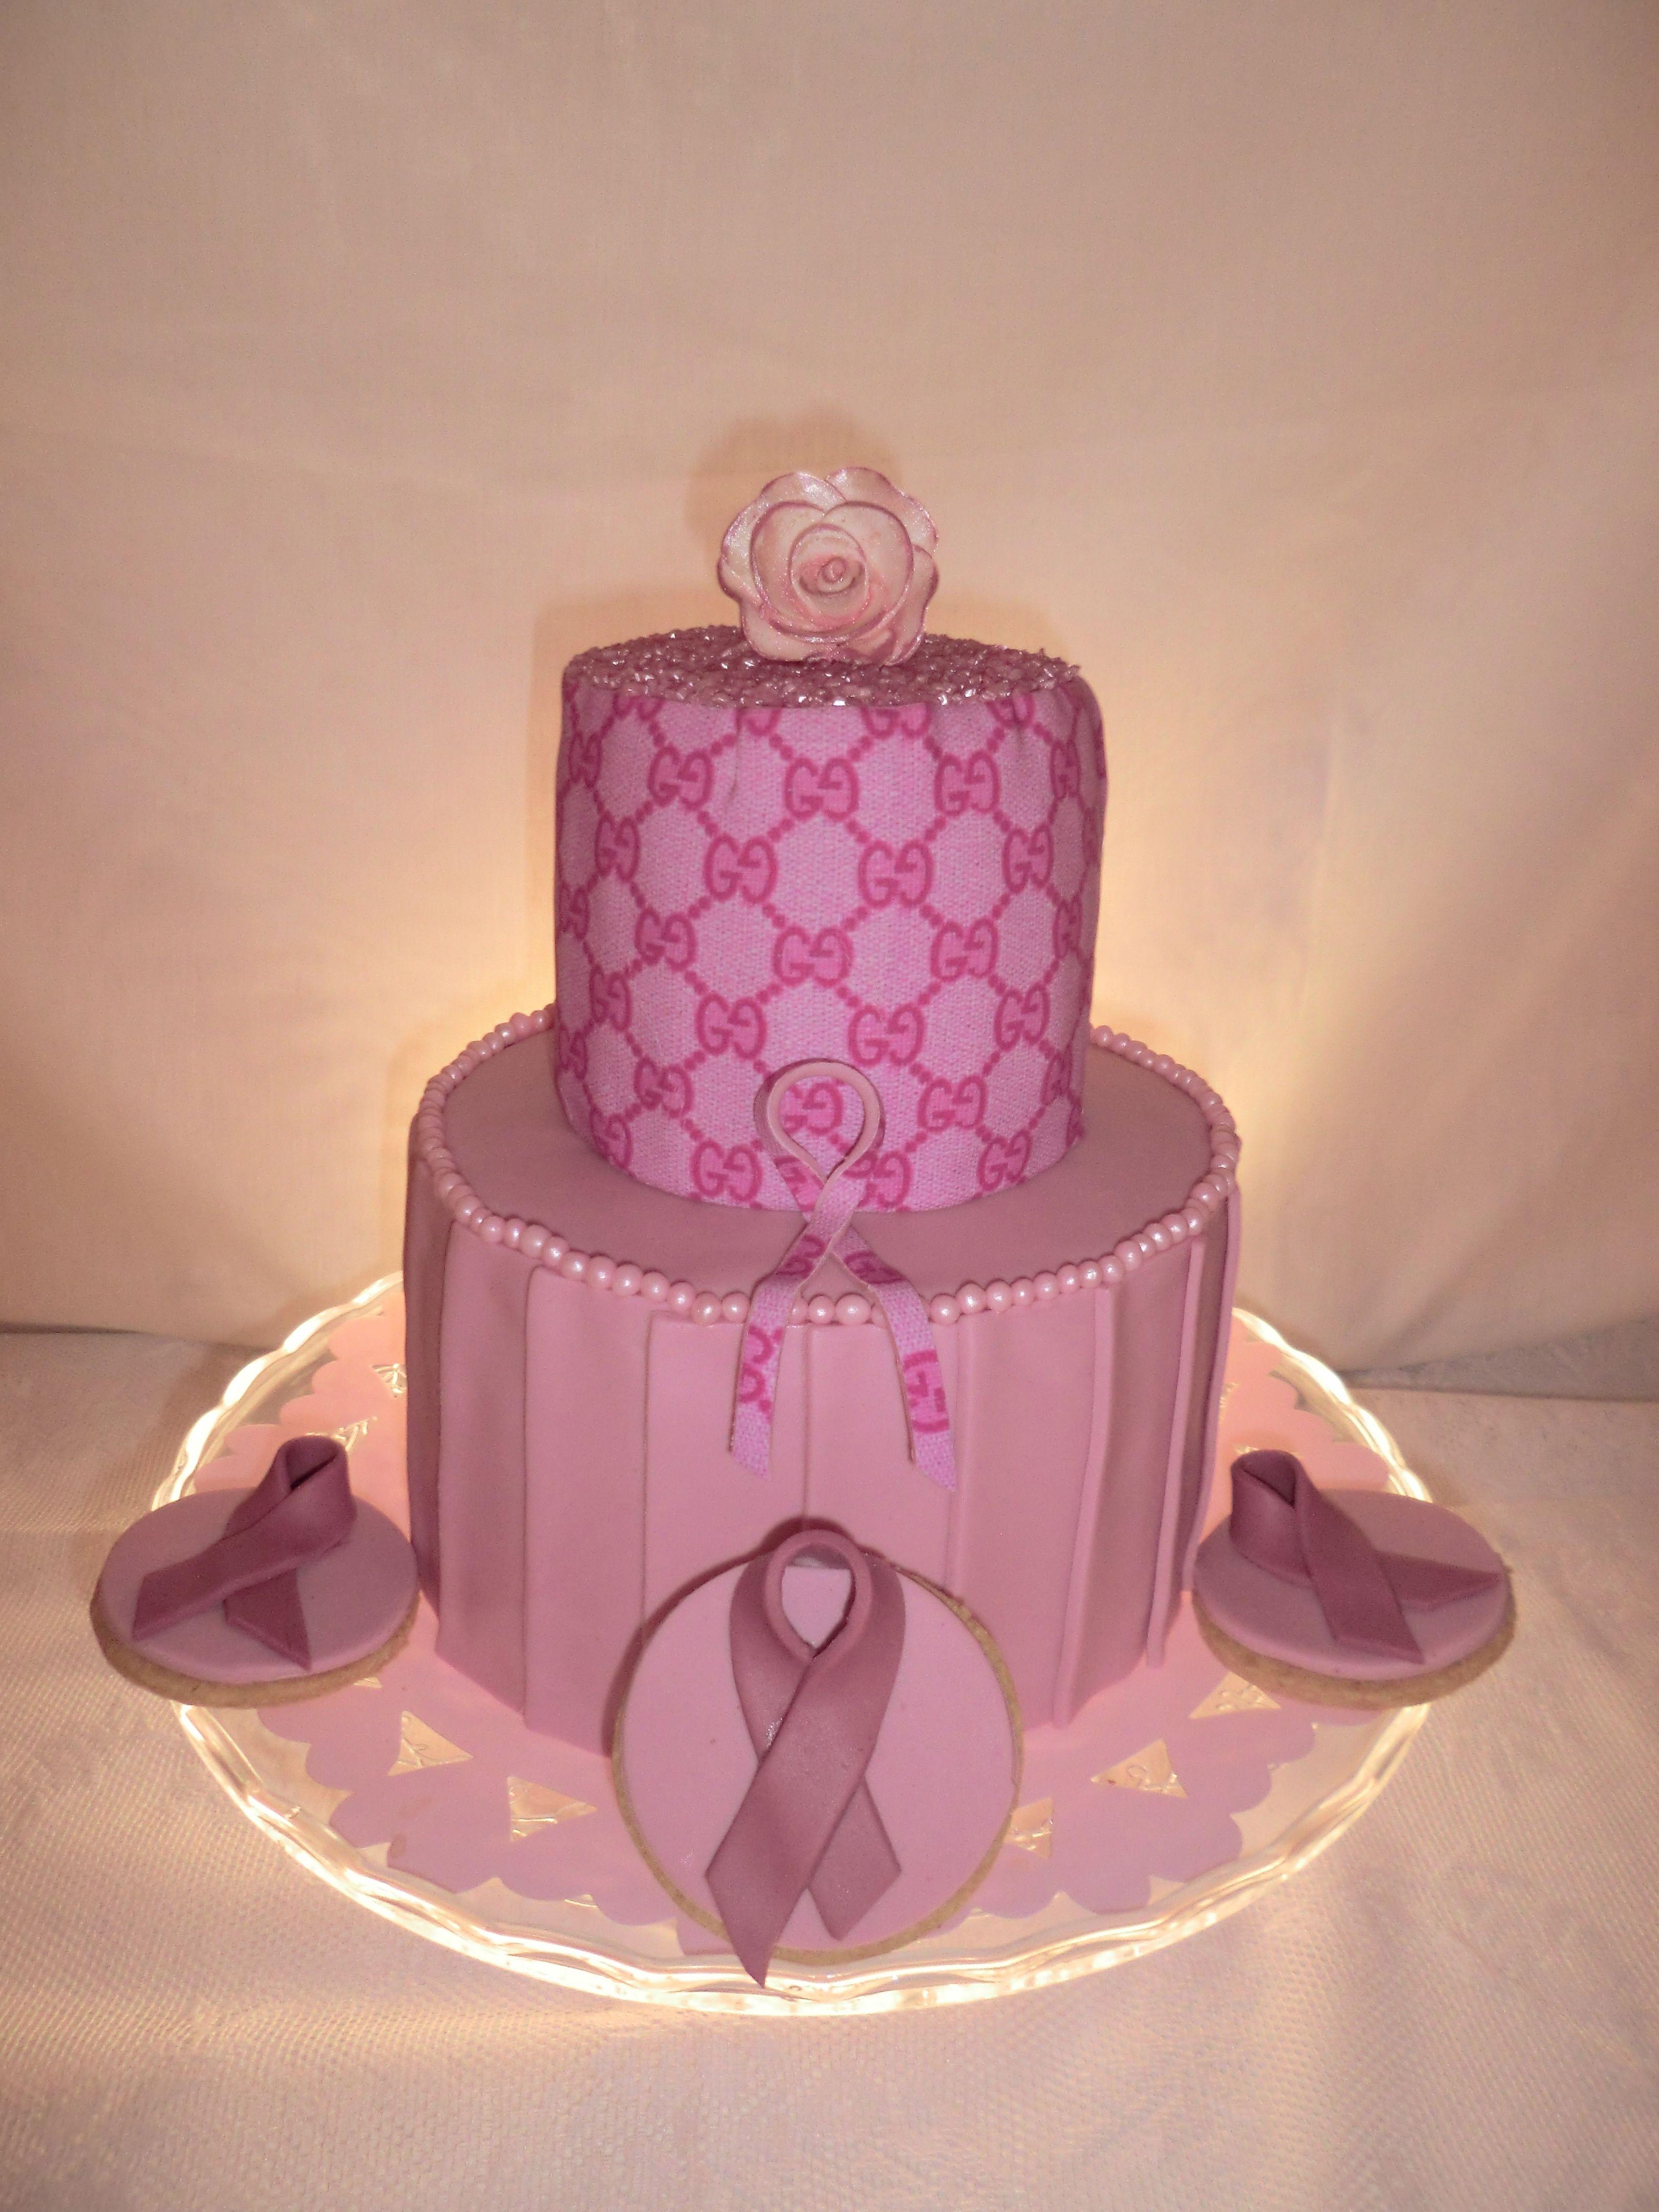 53287bad025c Gucci awareness party cake